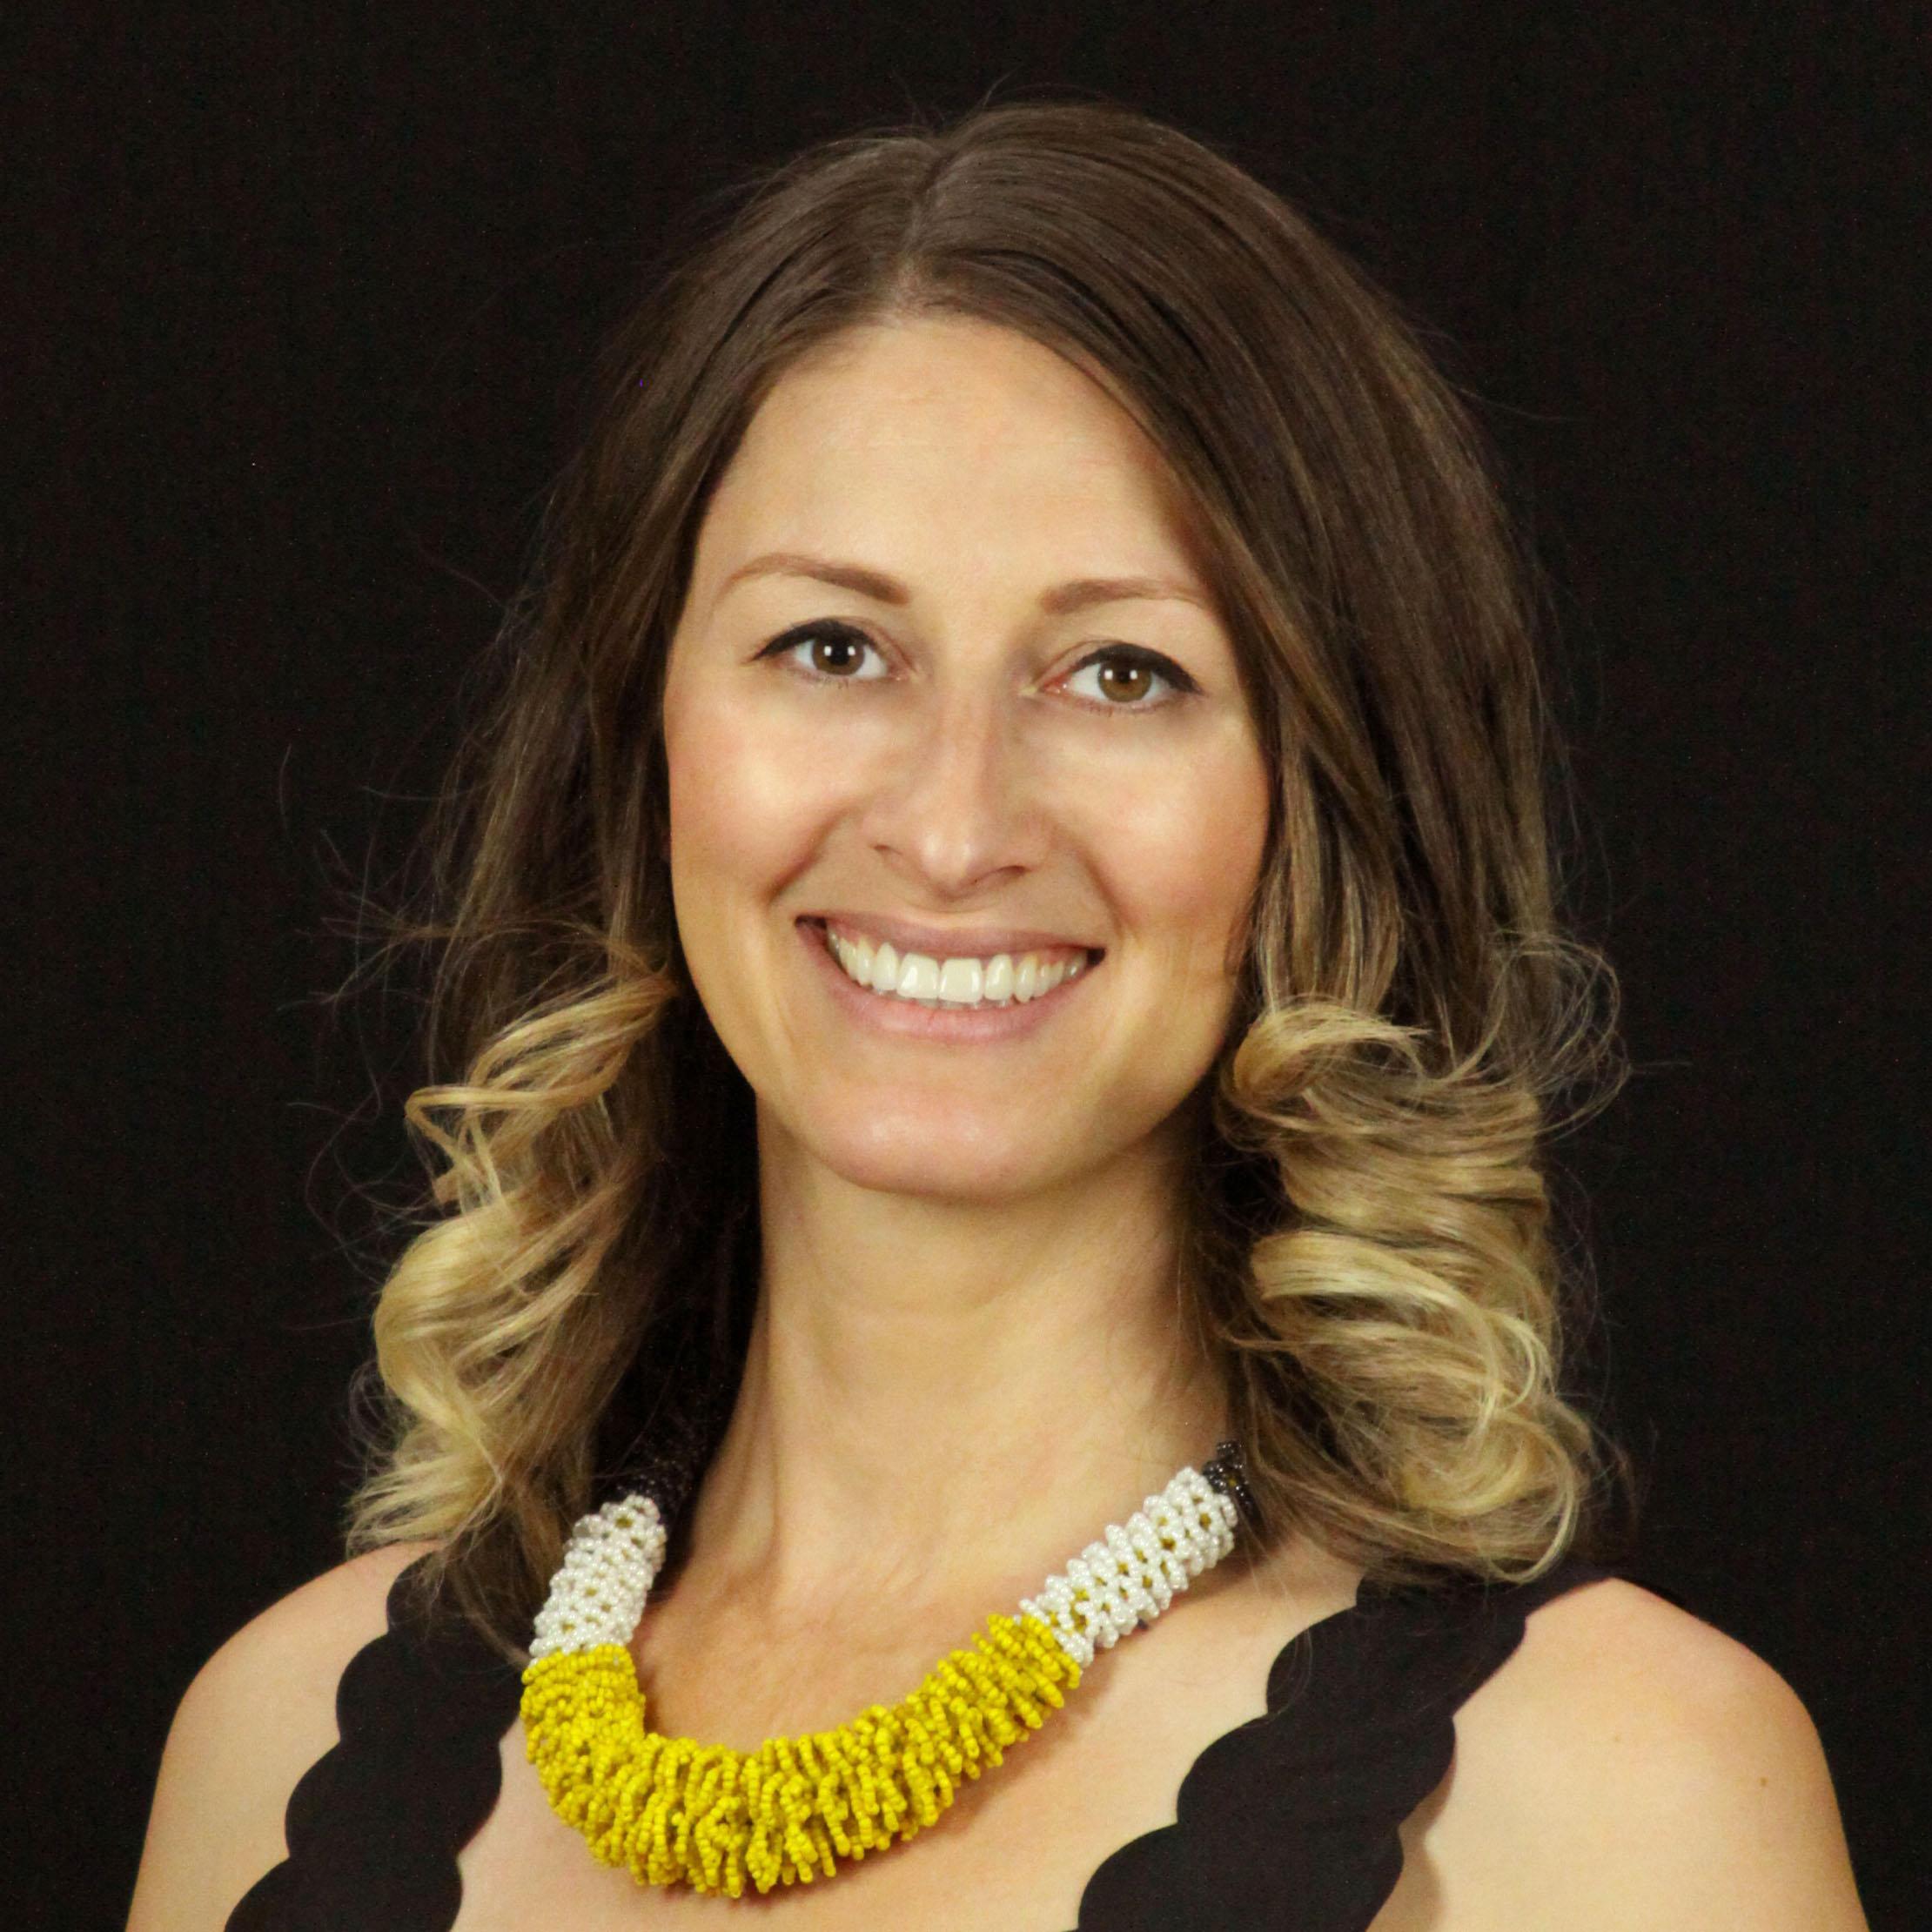 Angela Pfeiffenberger-Stacey